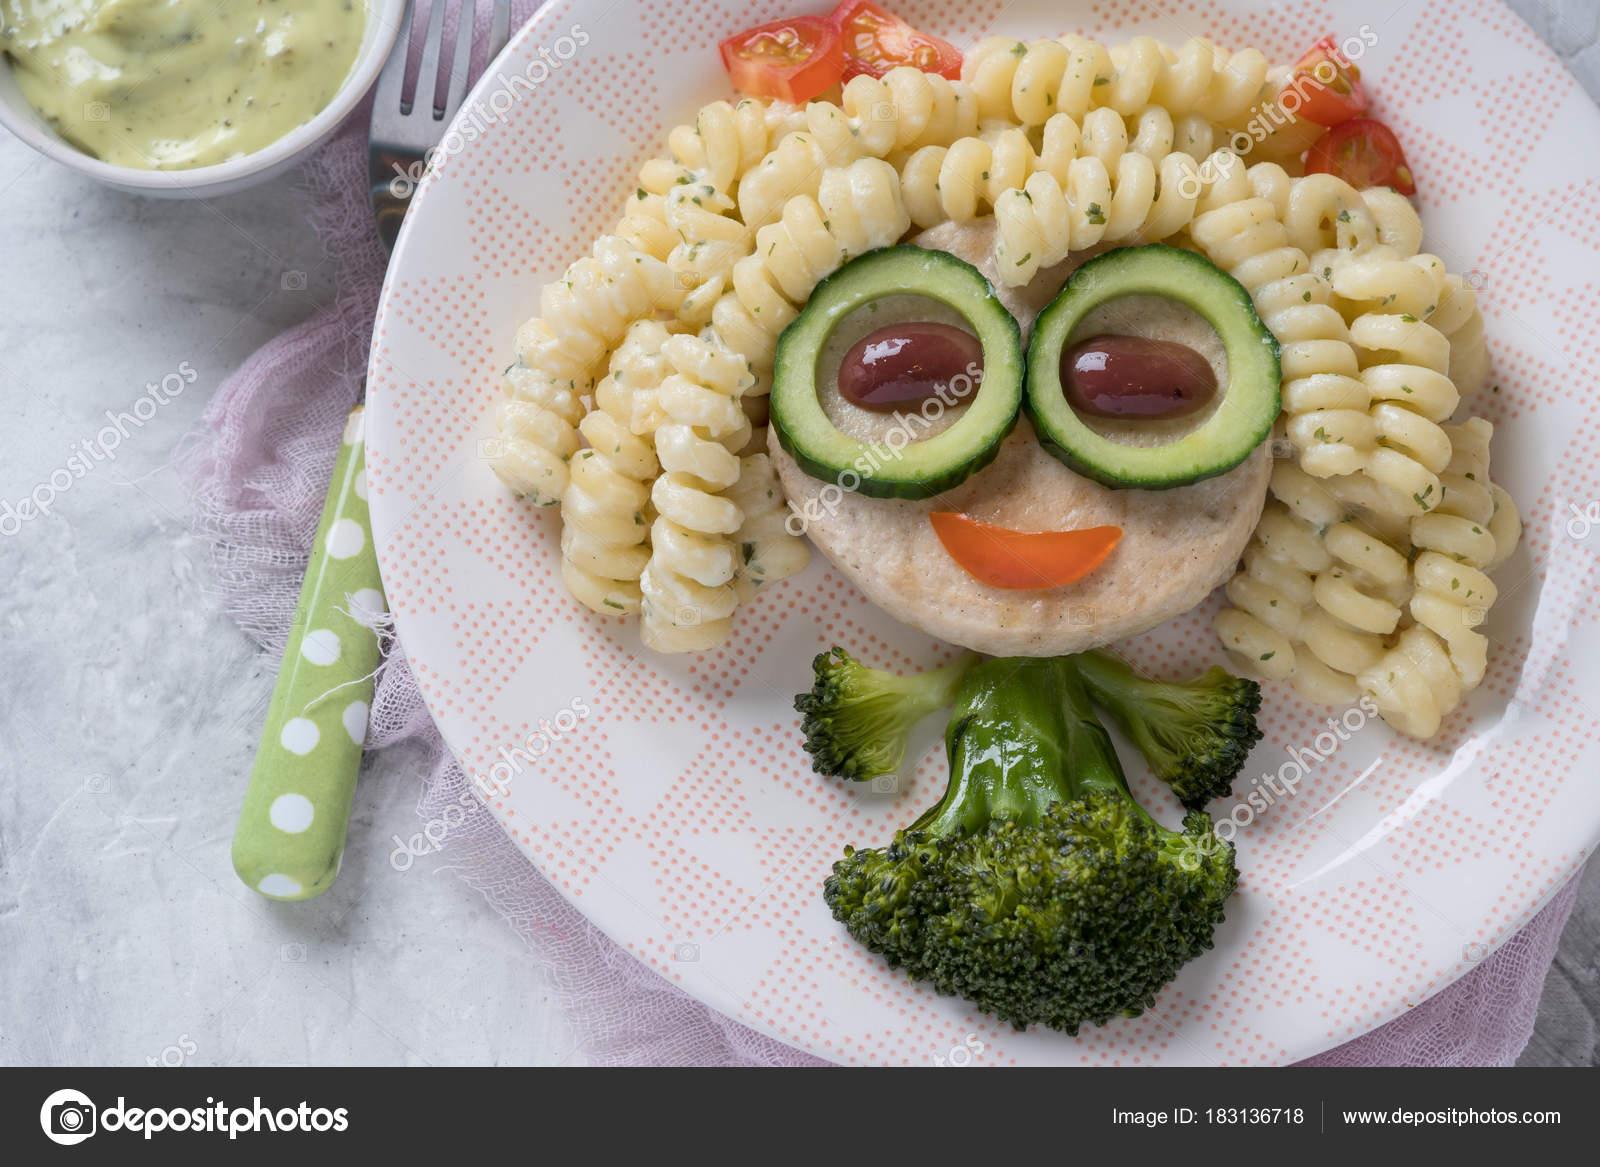 funny girl food face with cutlet pasta and vegetables stock photo odelinde 183136718. Black Bedroom Furniture Sets. Home Design Ideas